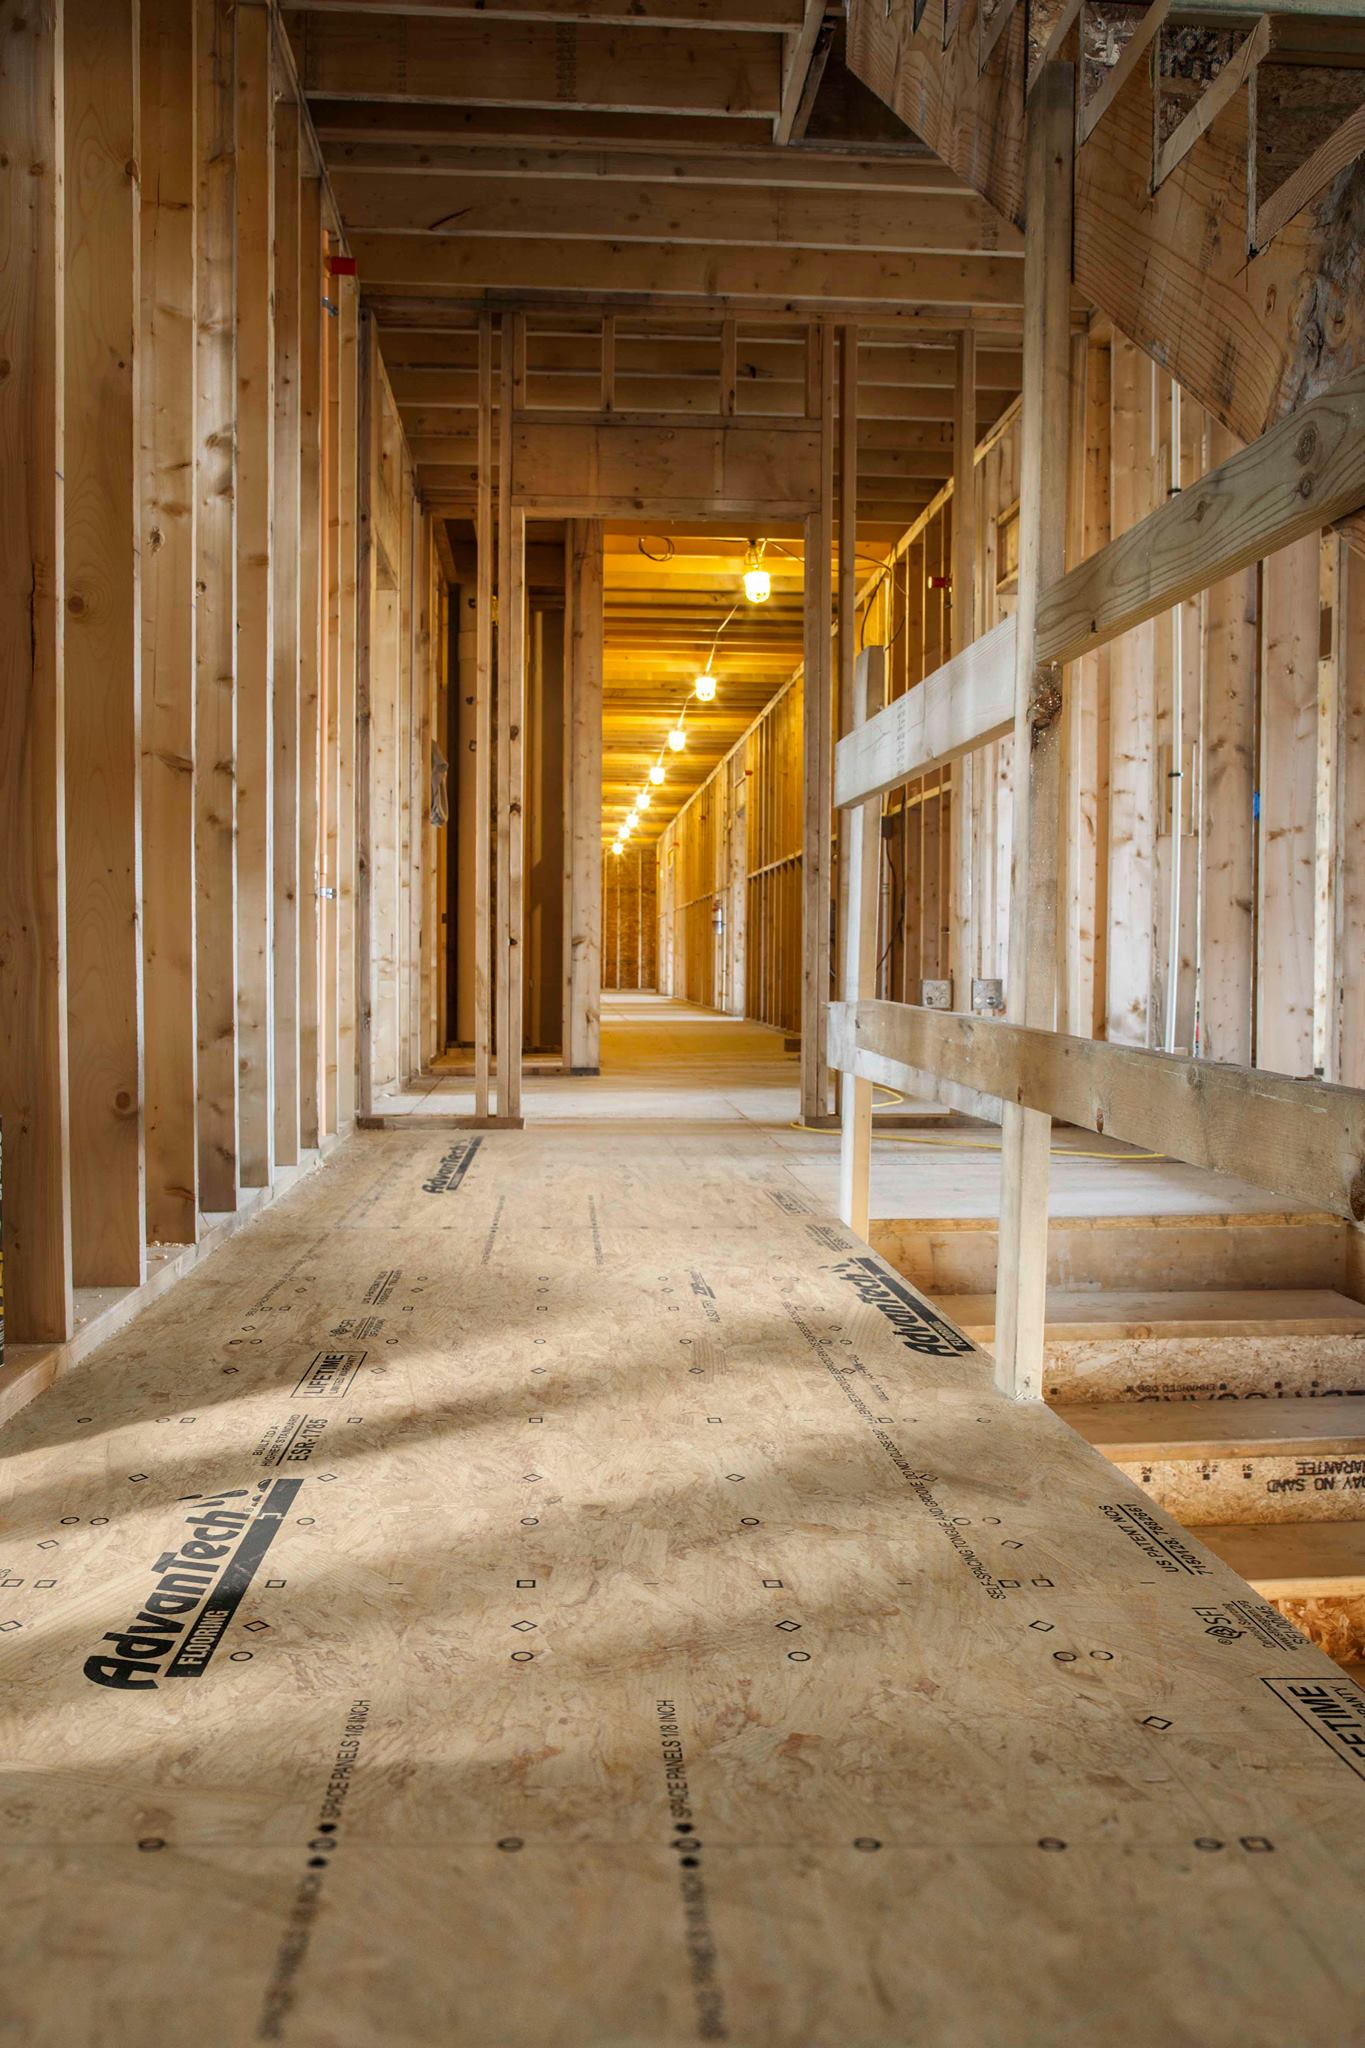 AdvanTech Roof & Wall Sheathing | Builders\' GeneralBuilders General